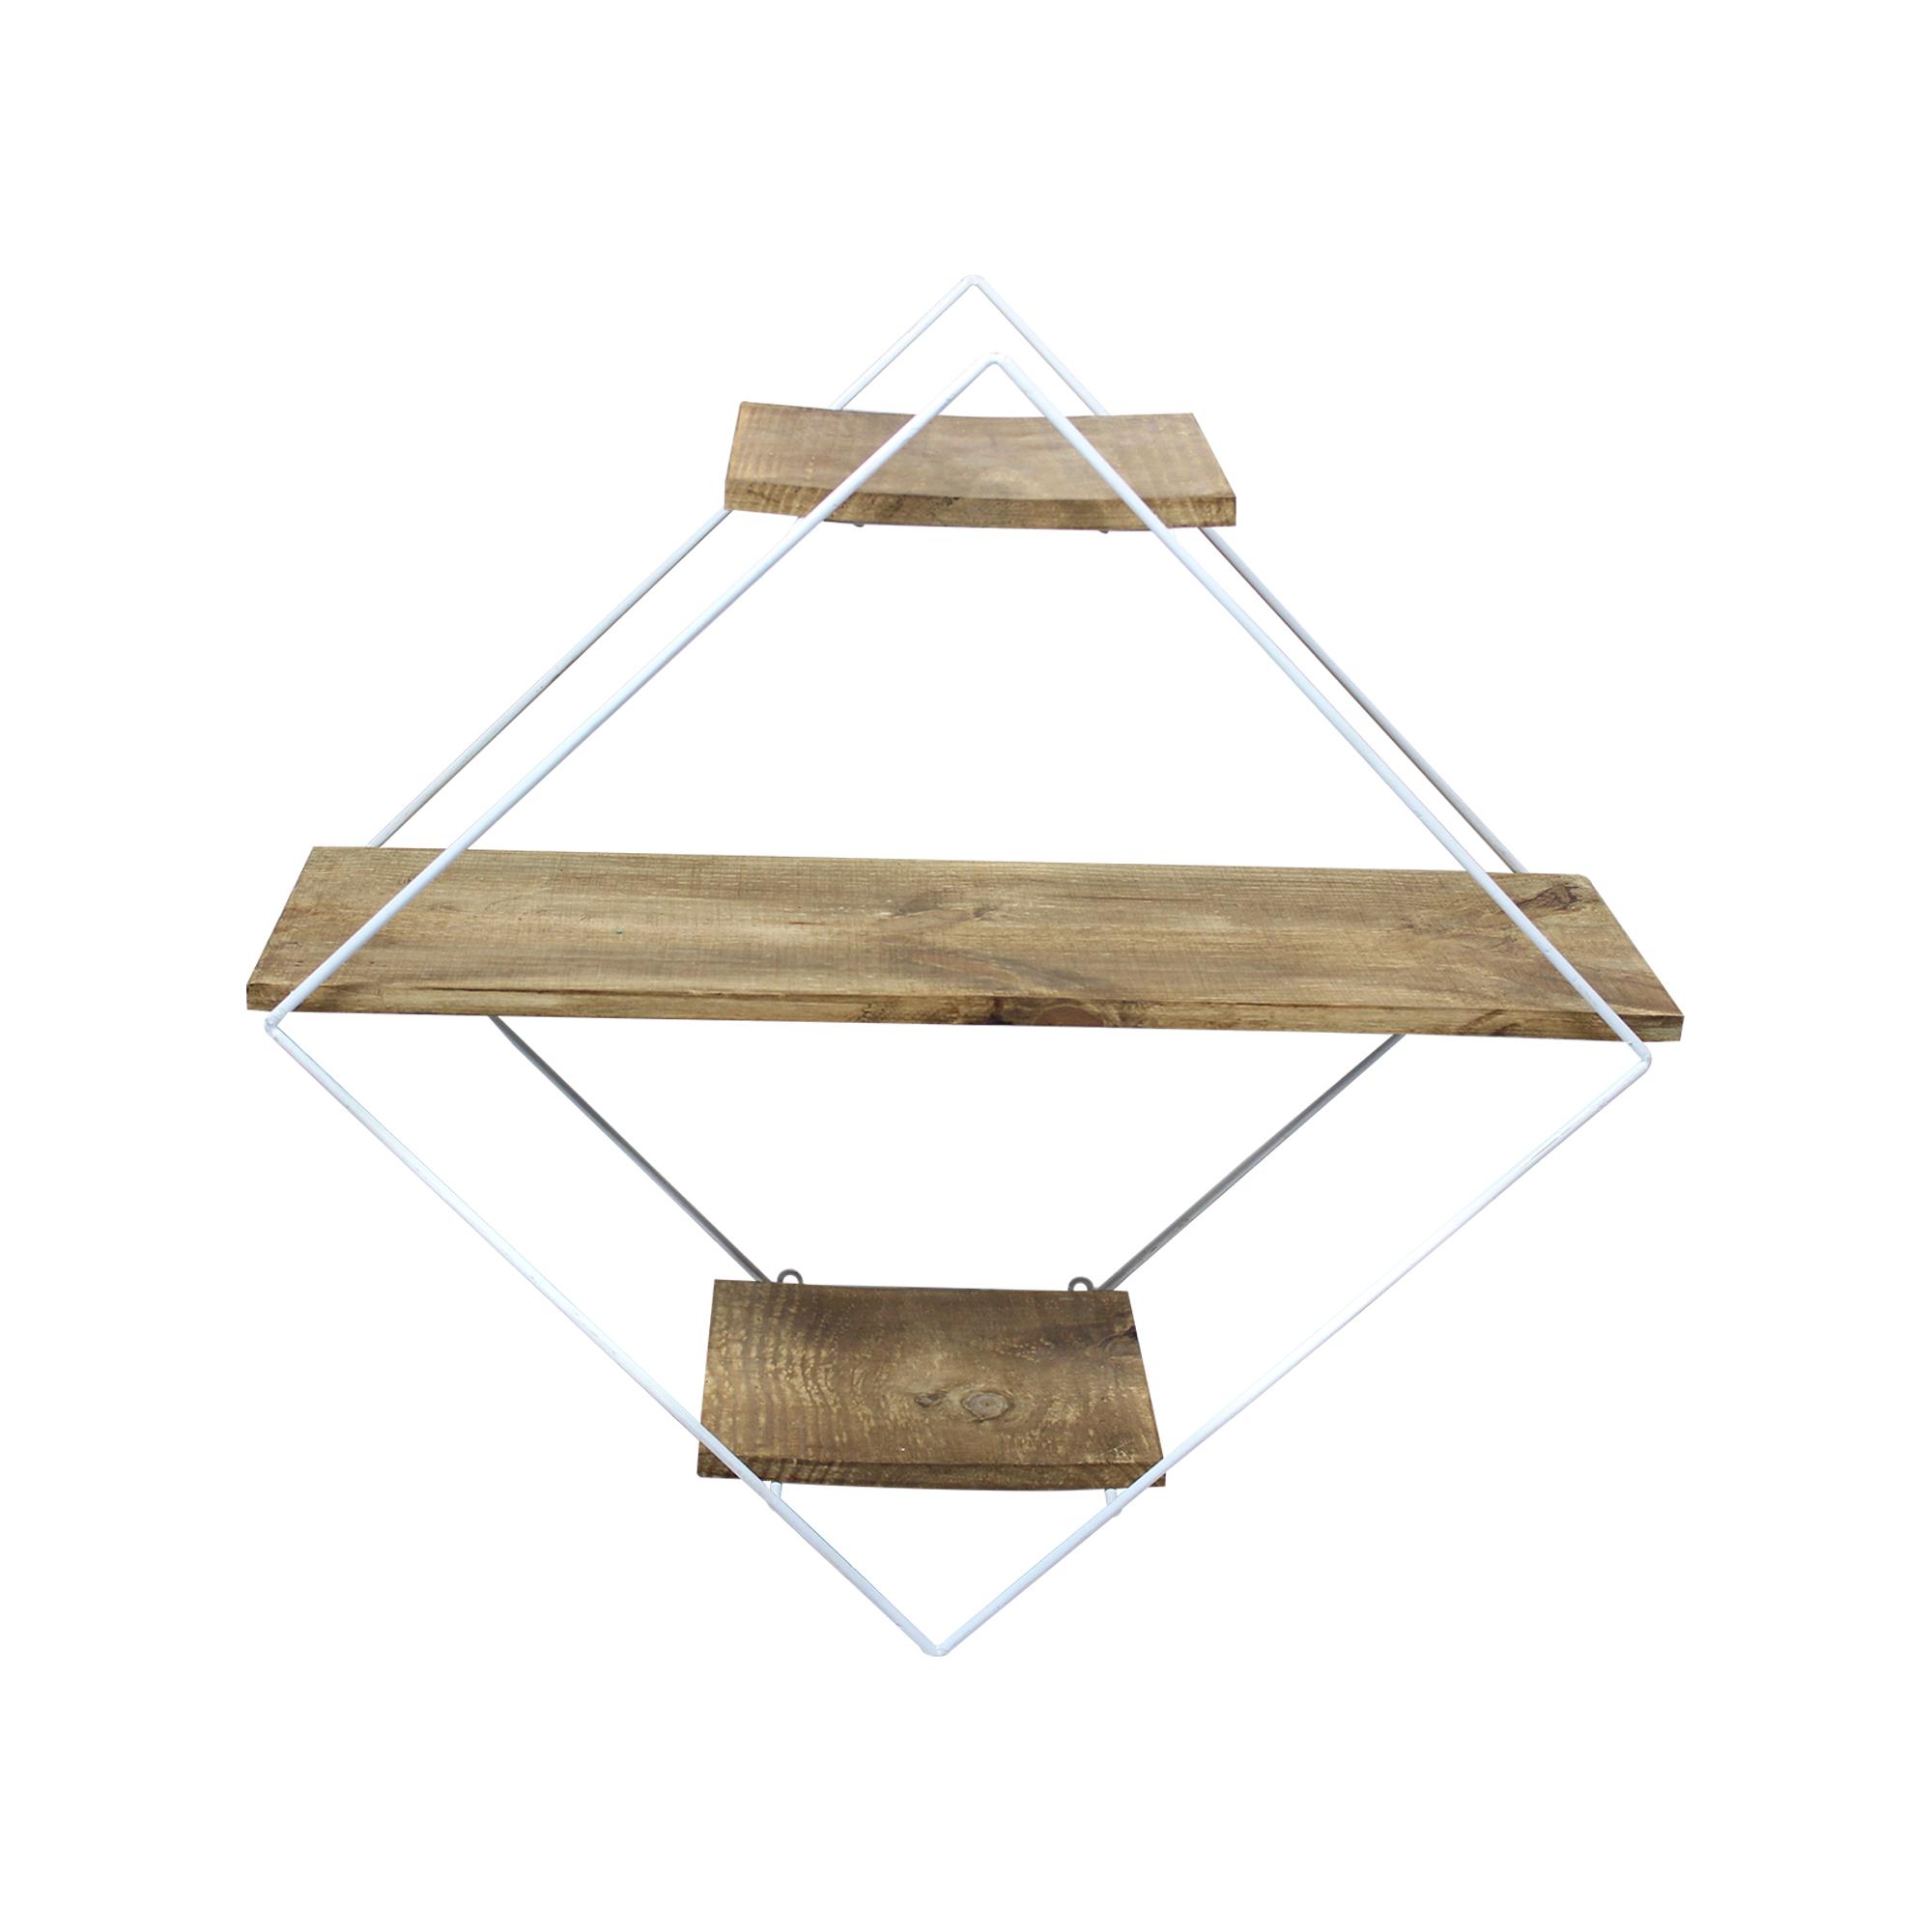 Prateleira Triângulo Madeira